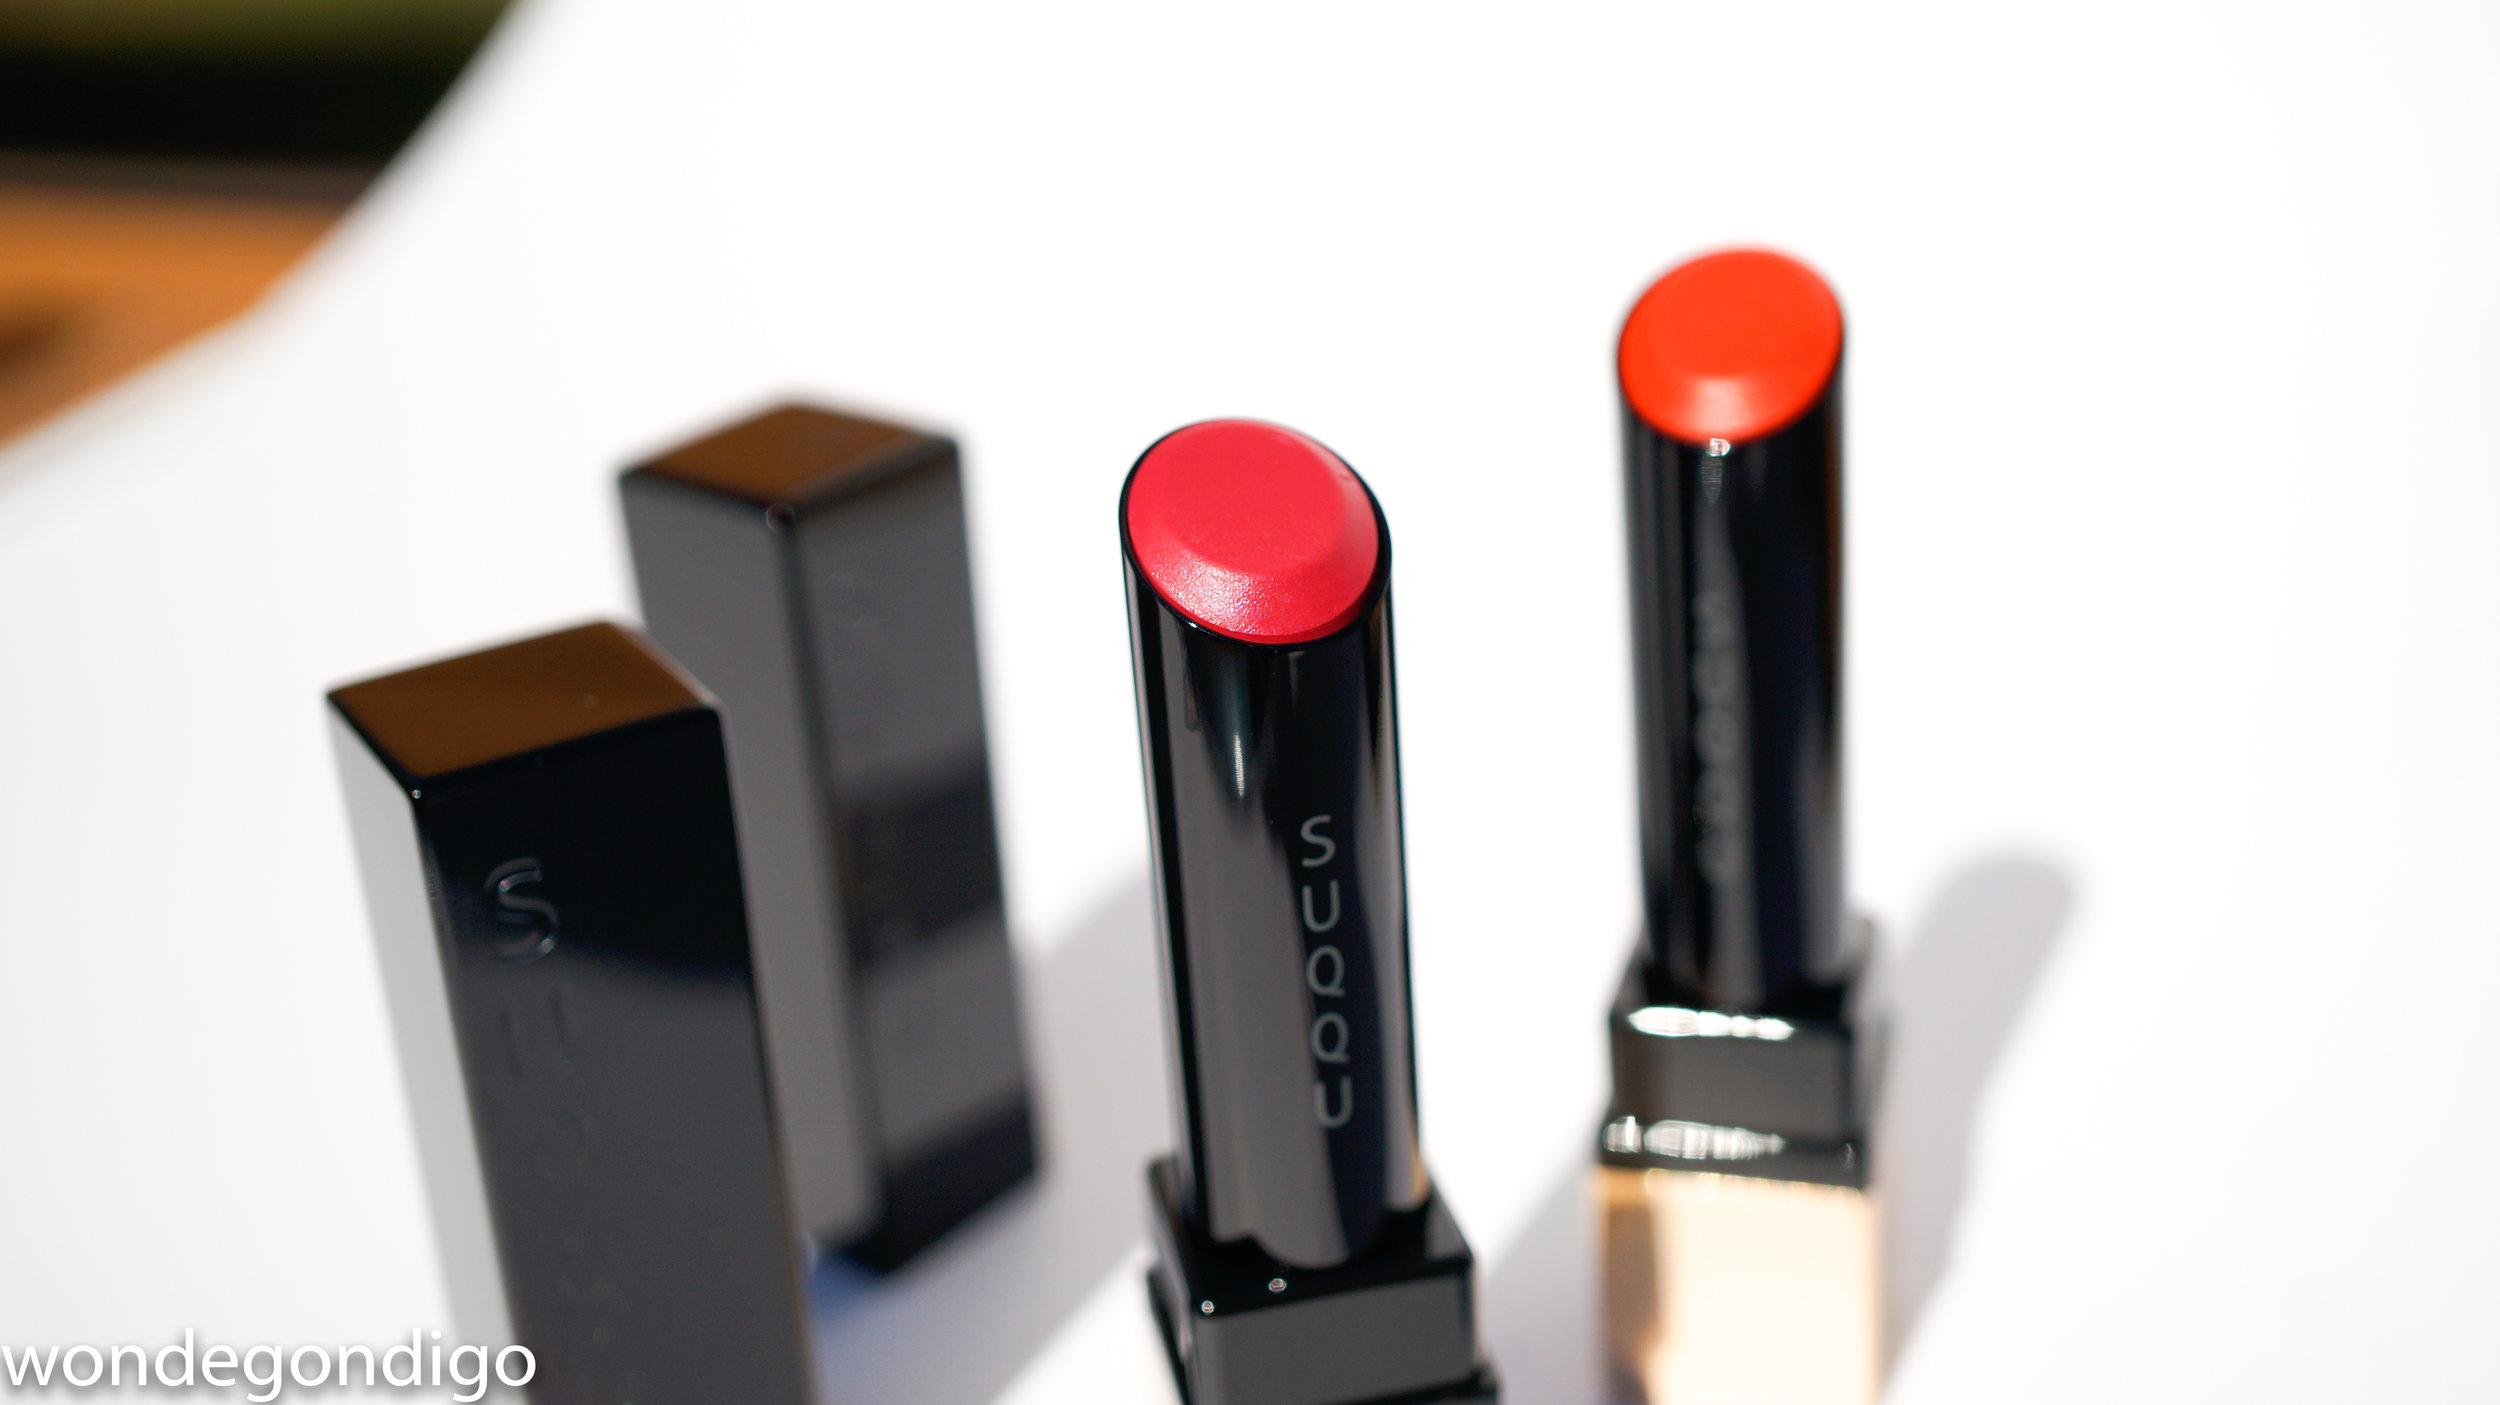 SUQQU Extra Glow Lipsticks (L) 104 Tsuyazakuro (R)105 Hamadaidai